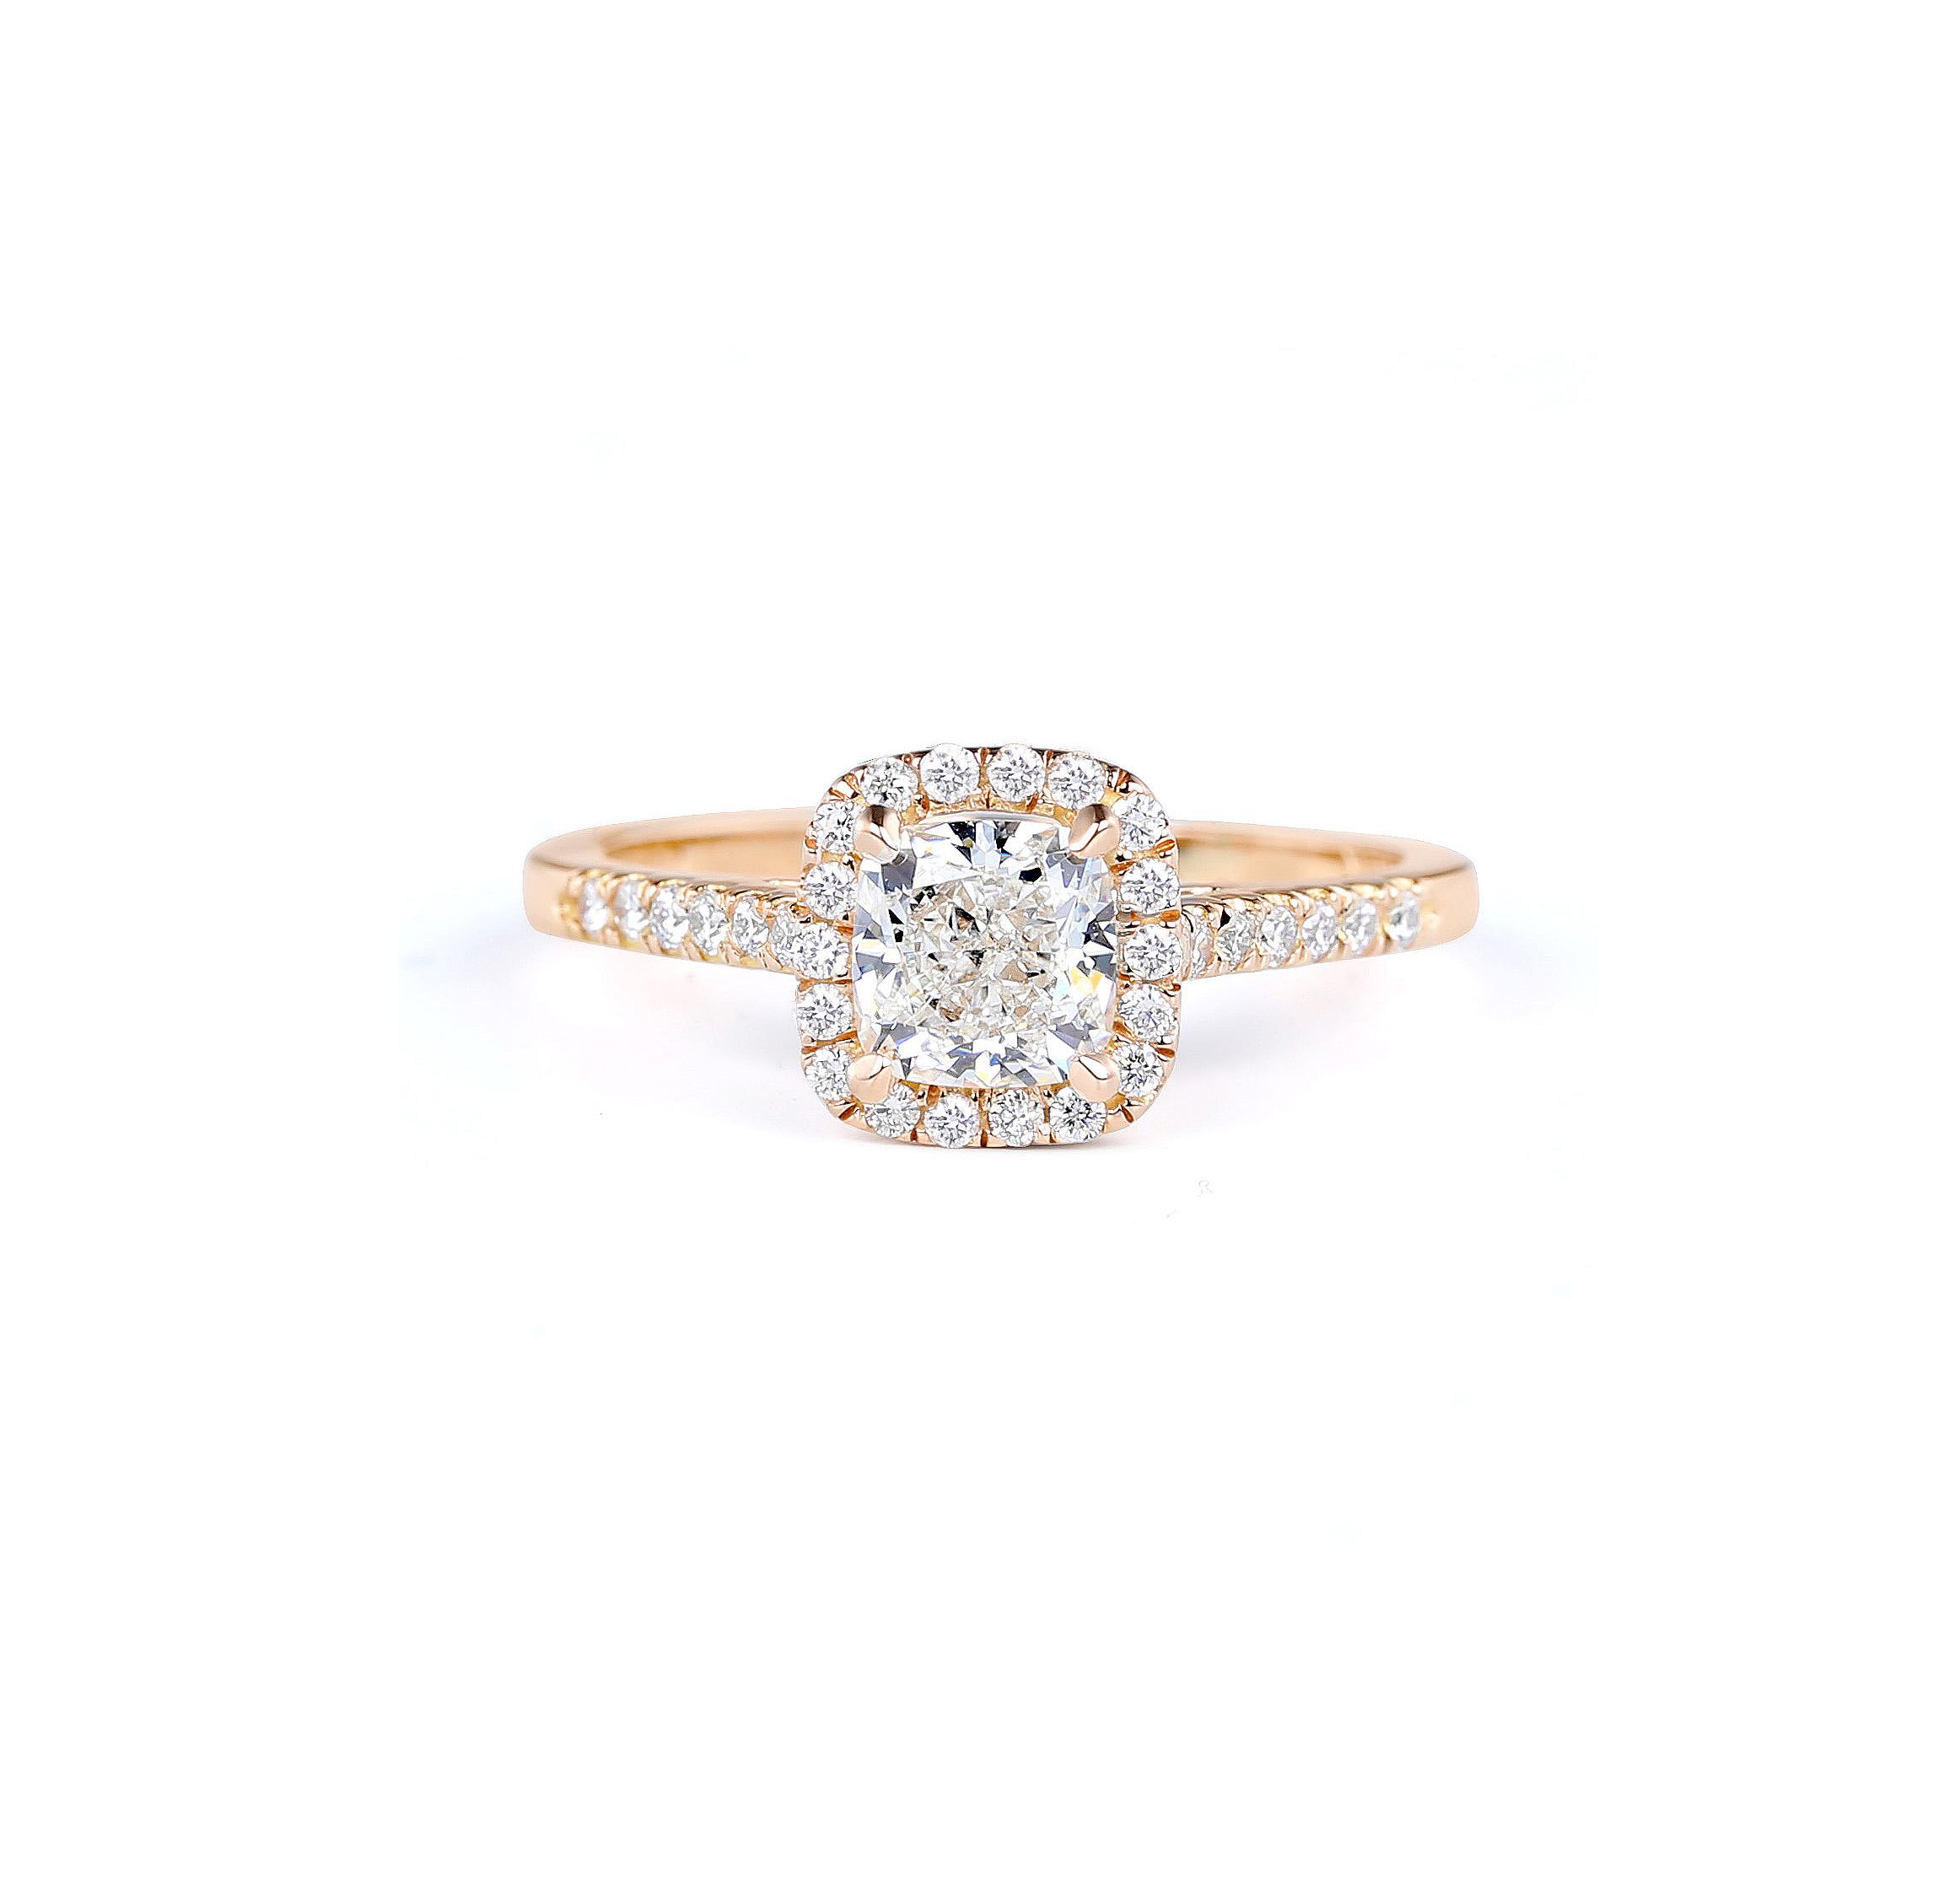 forevermark premier gem cushion cut engagement ring in rose gold